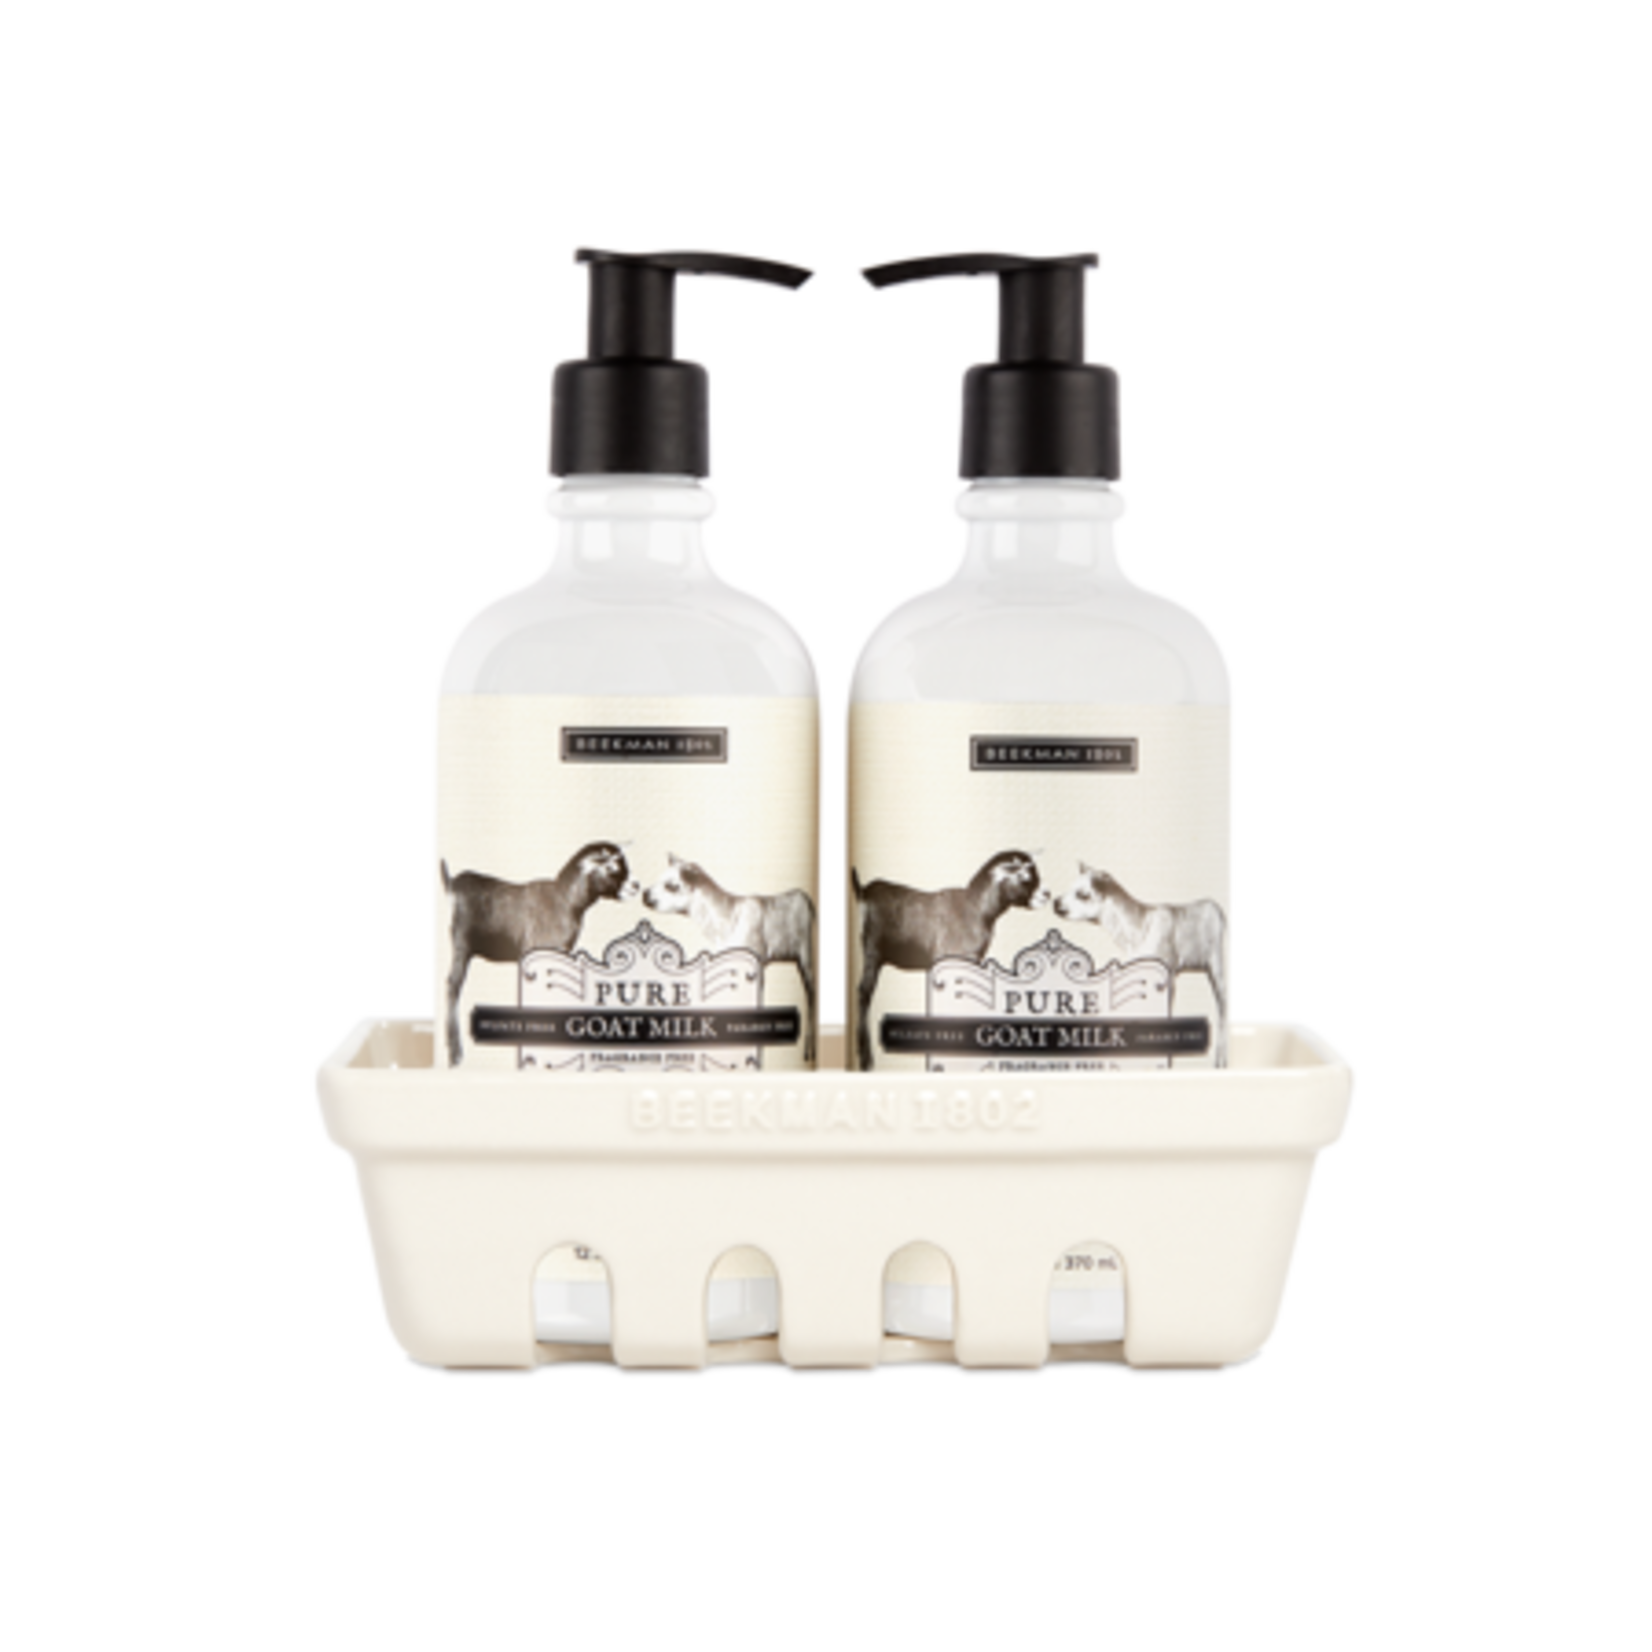 BEEKMAN 1802 Pure Goat Milk Hand Care Caddy